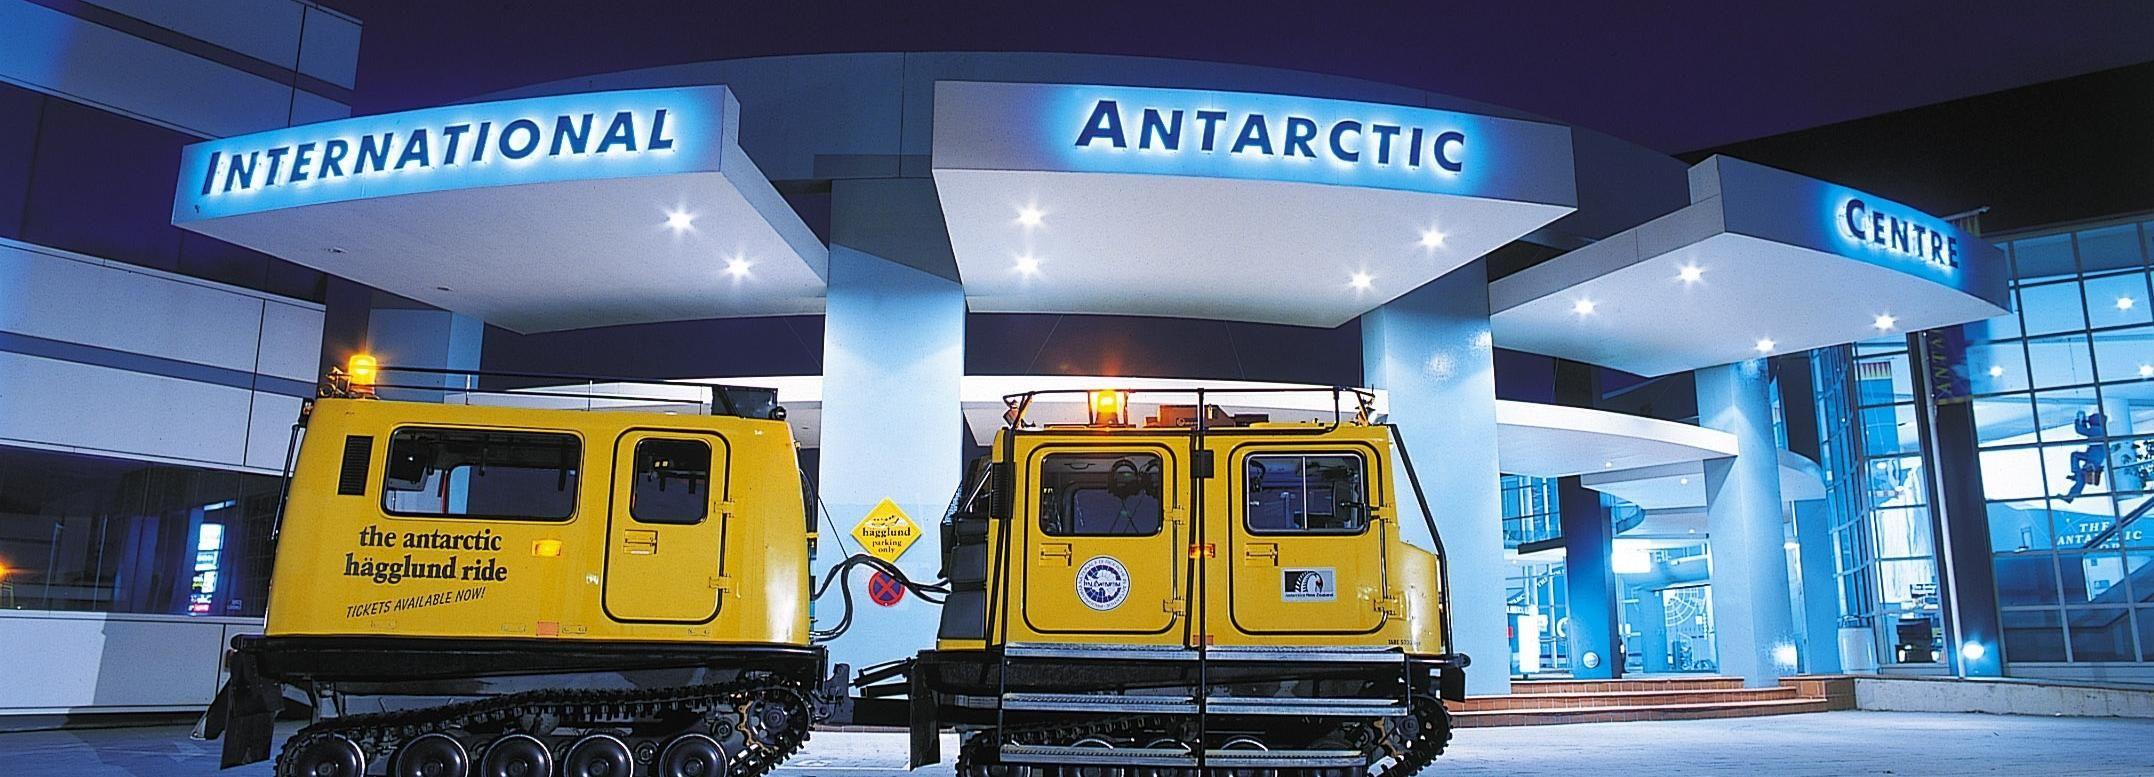 City Sightseeing Tour met Internationaal Antarctisch Centrum